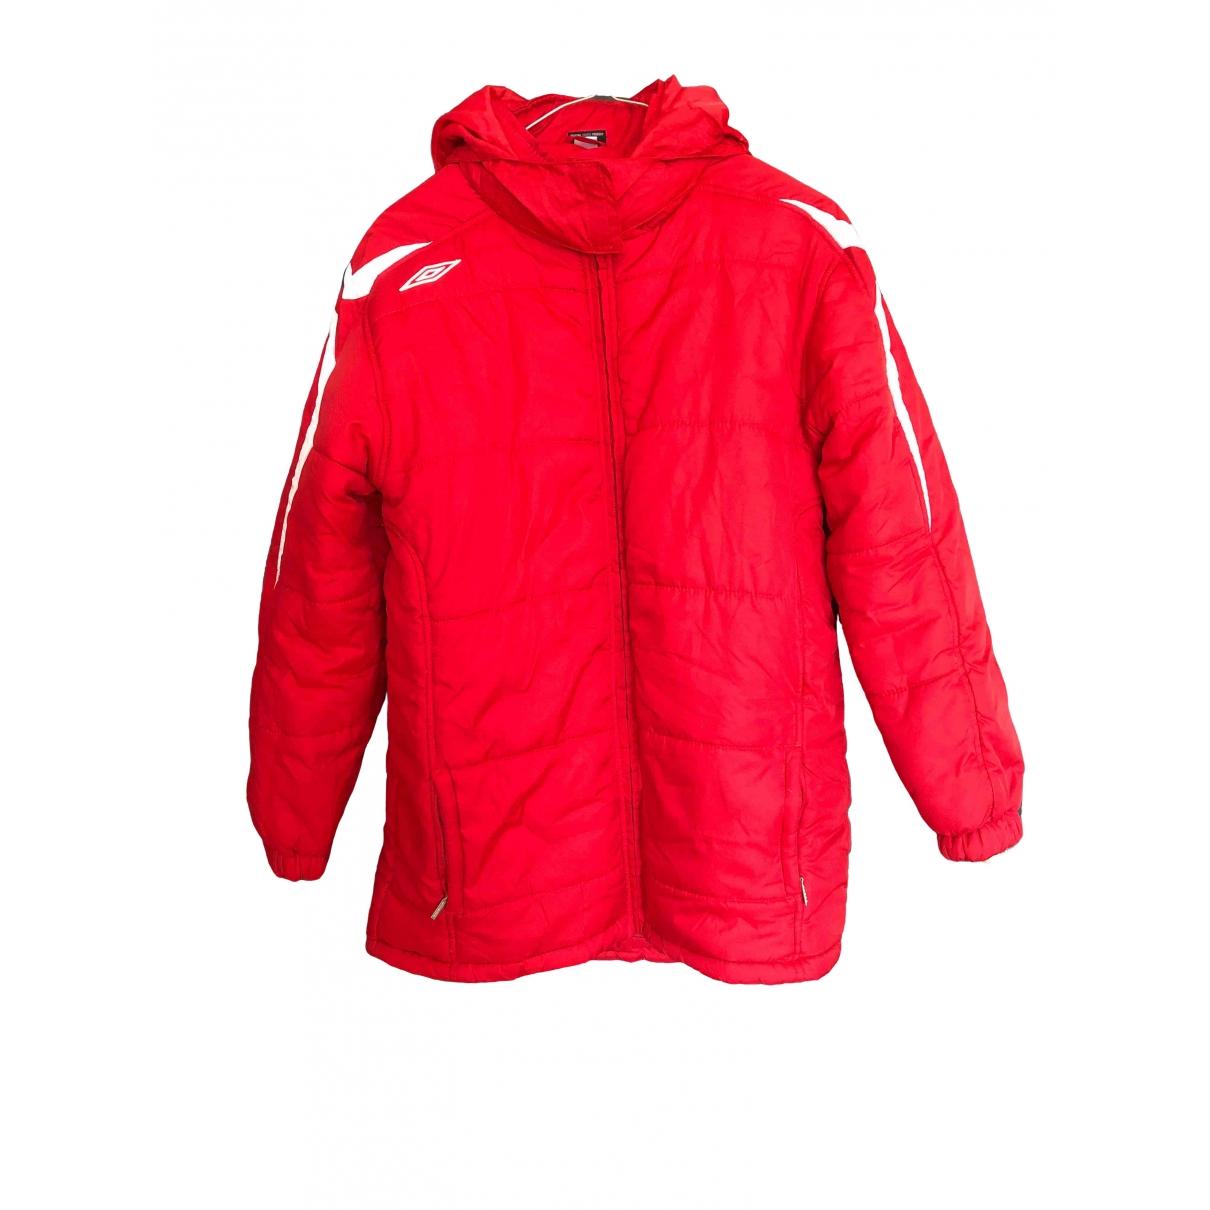 Umbro \N Maentel in  Rot Polyester